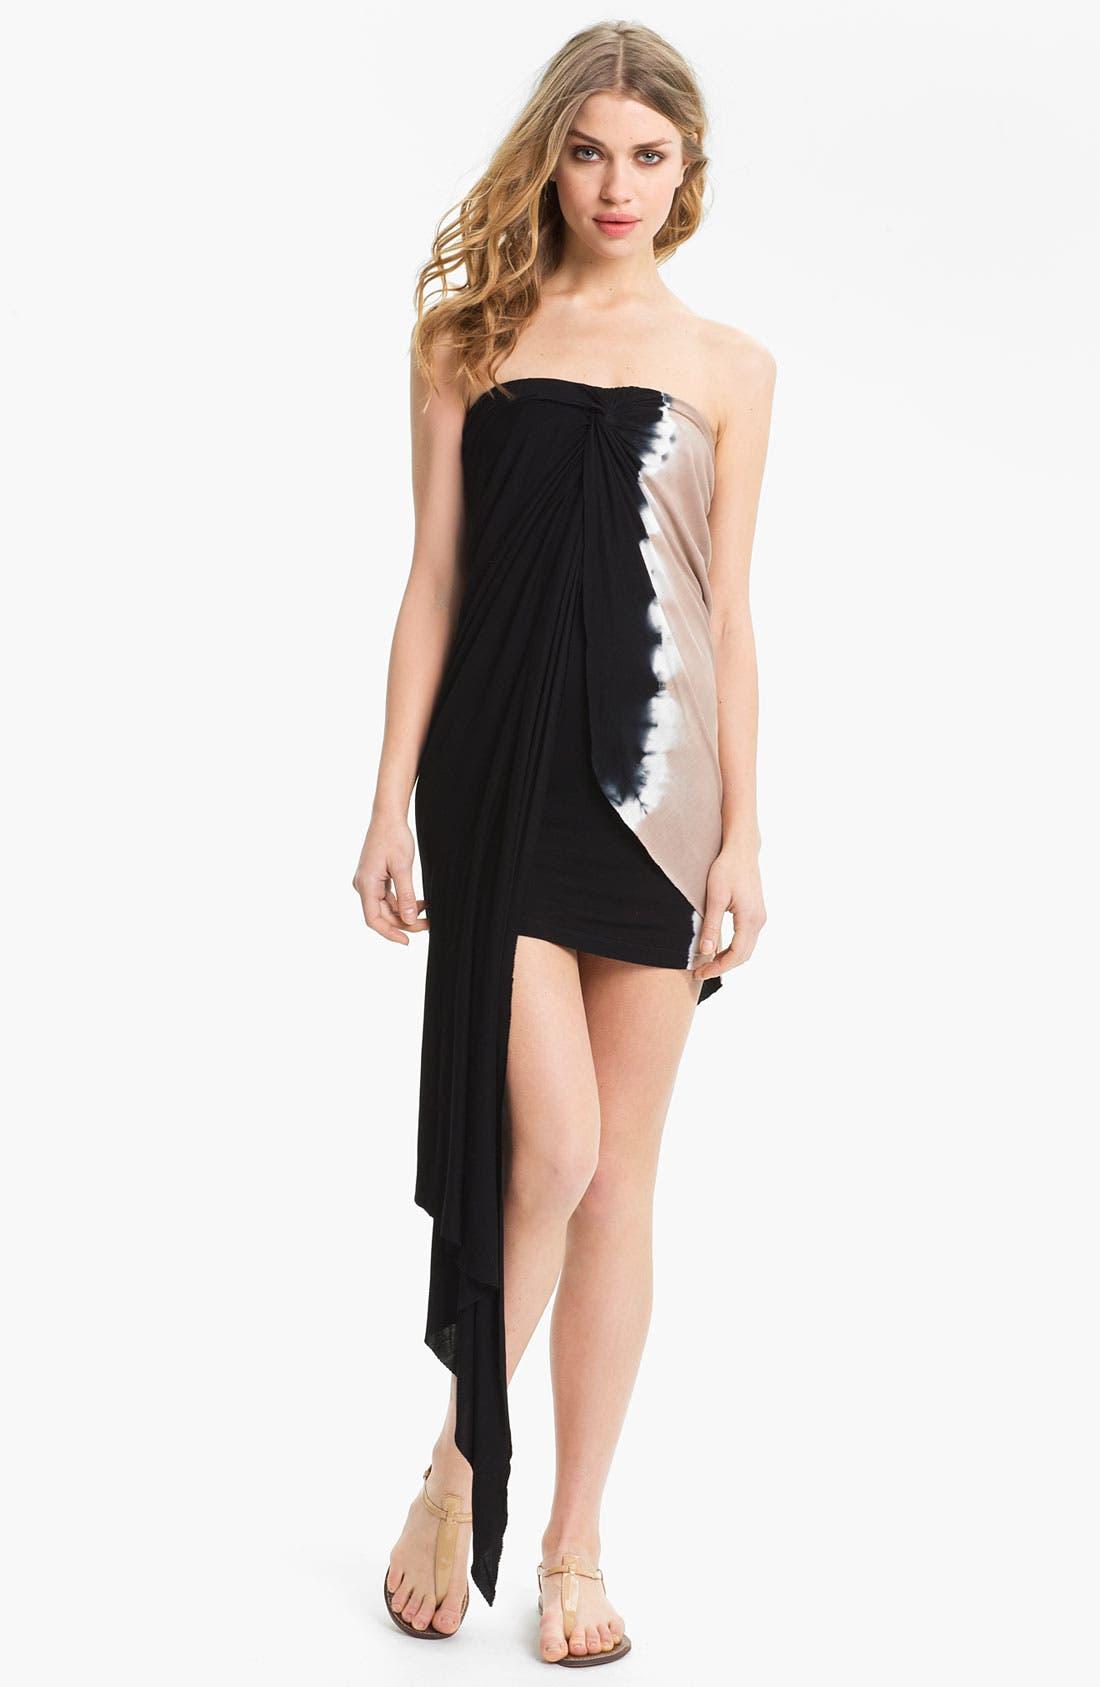 Main Image - Young, Fabulous & Broke 'Kai' Strapless Cascade Dress